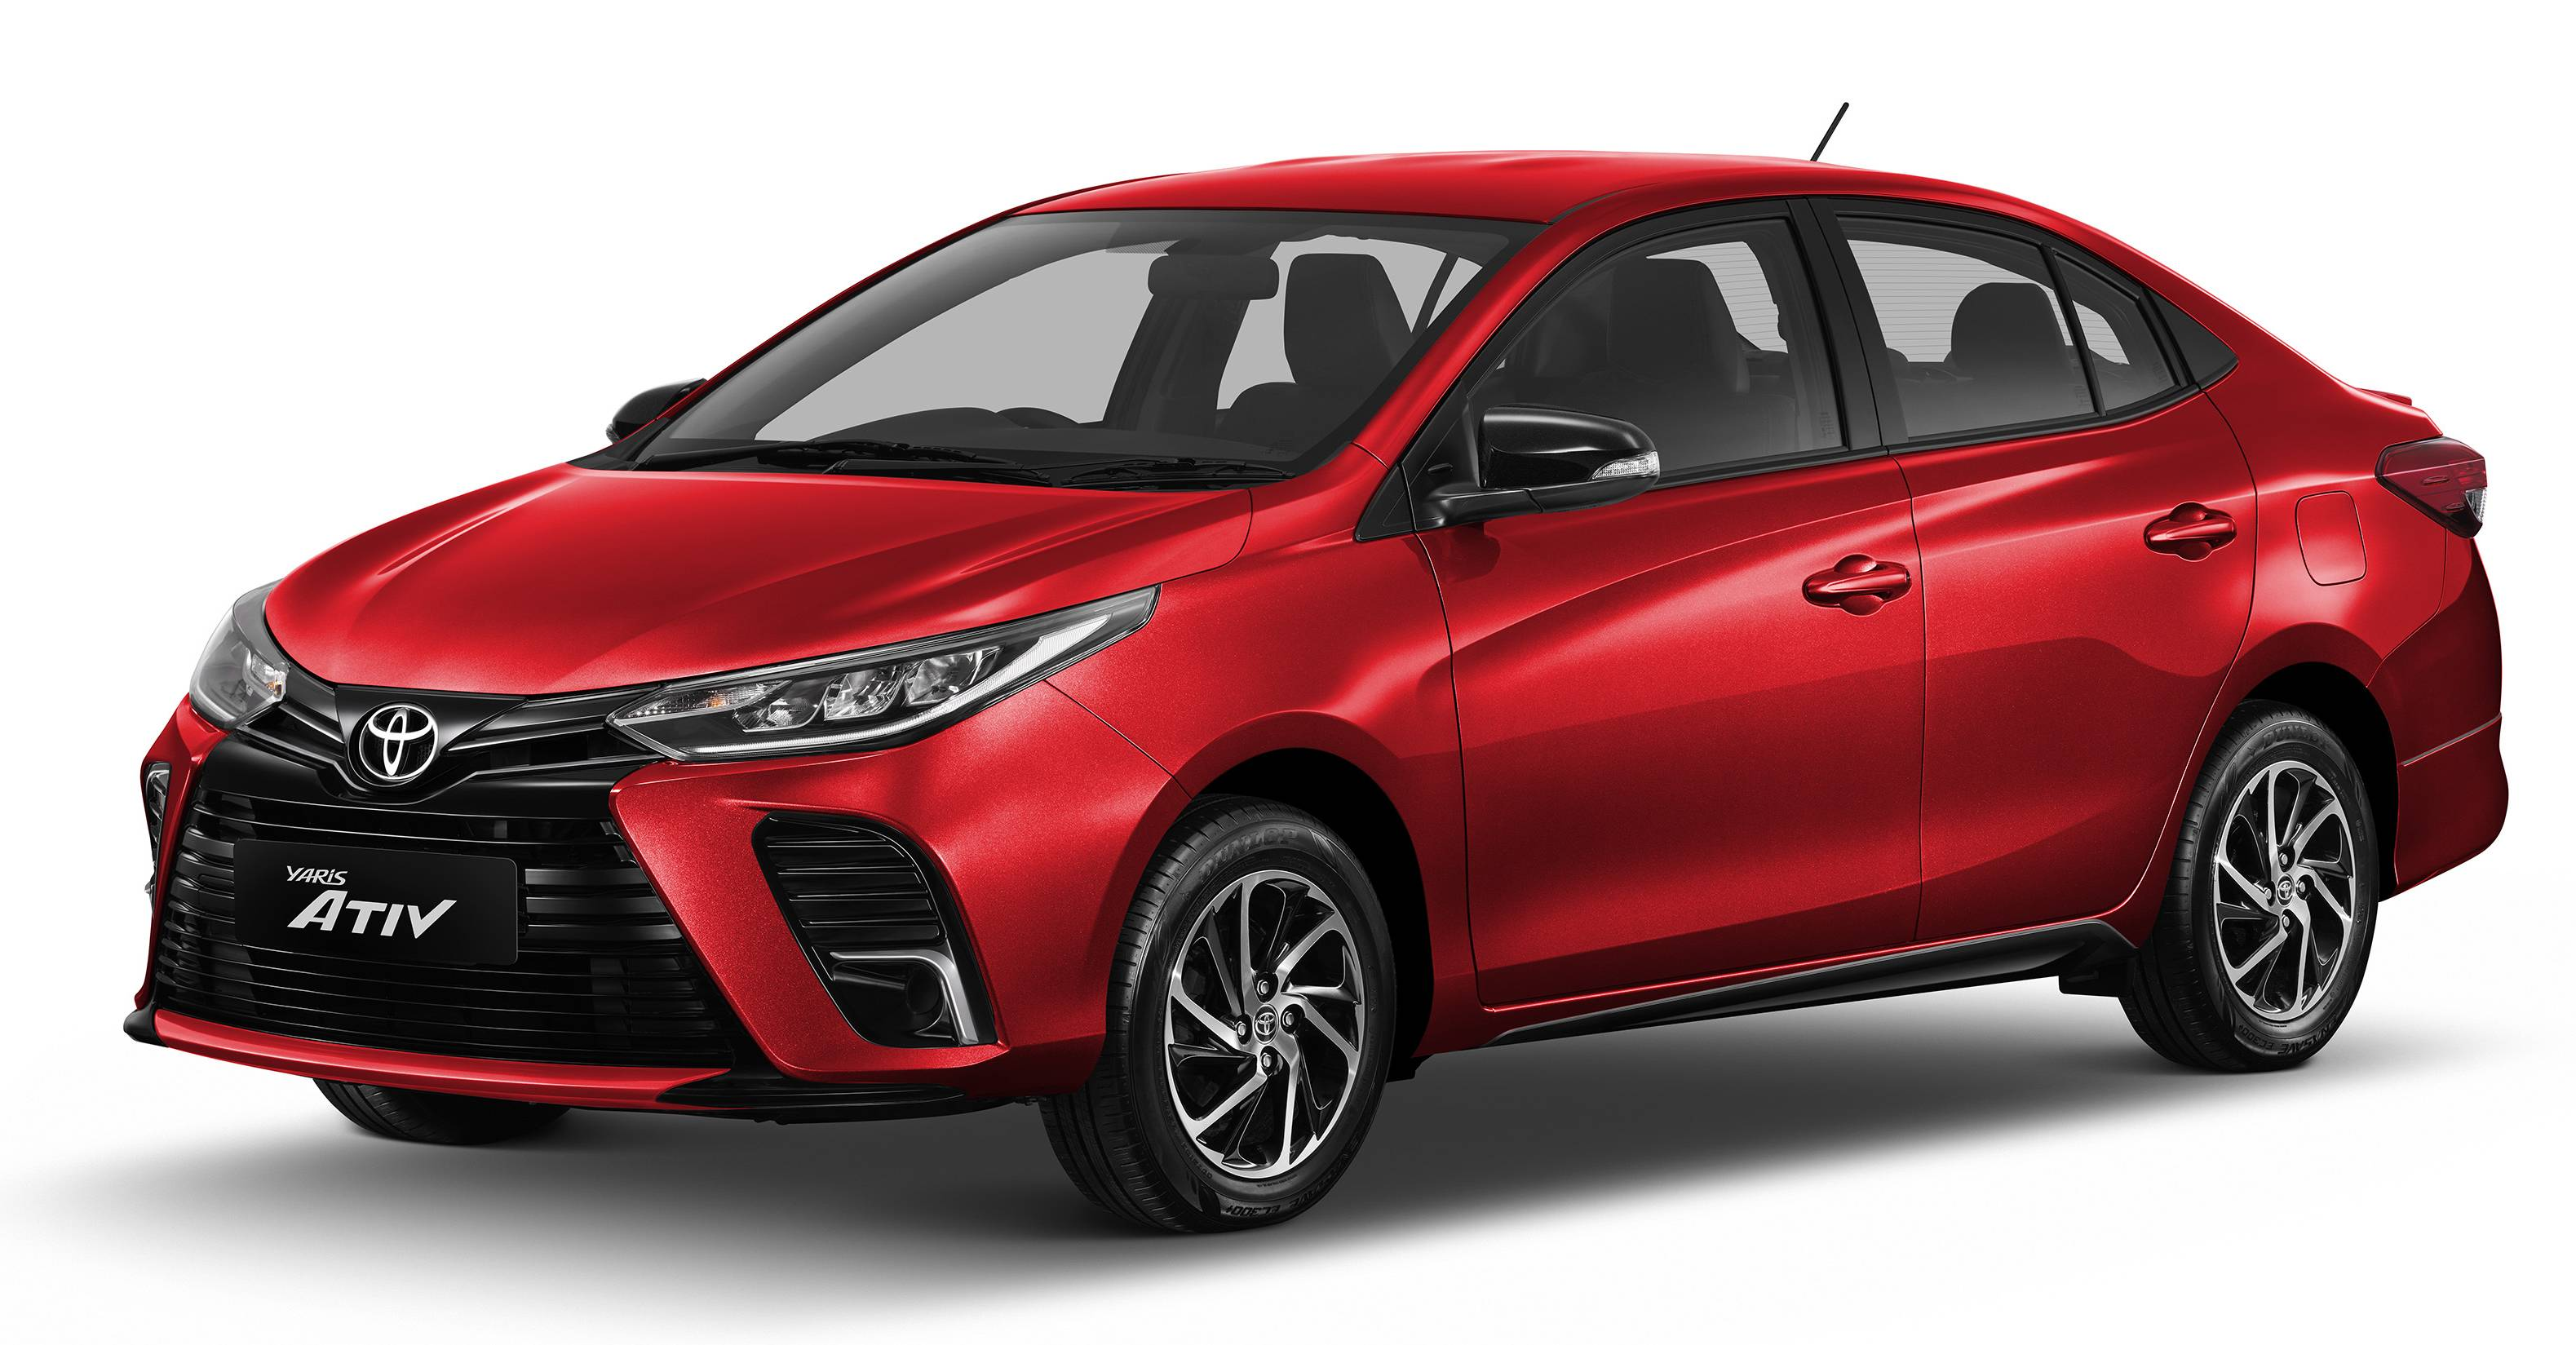 2022 Toyota Yaris Ativ Thailand-28